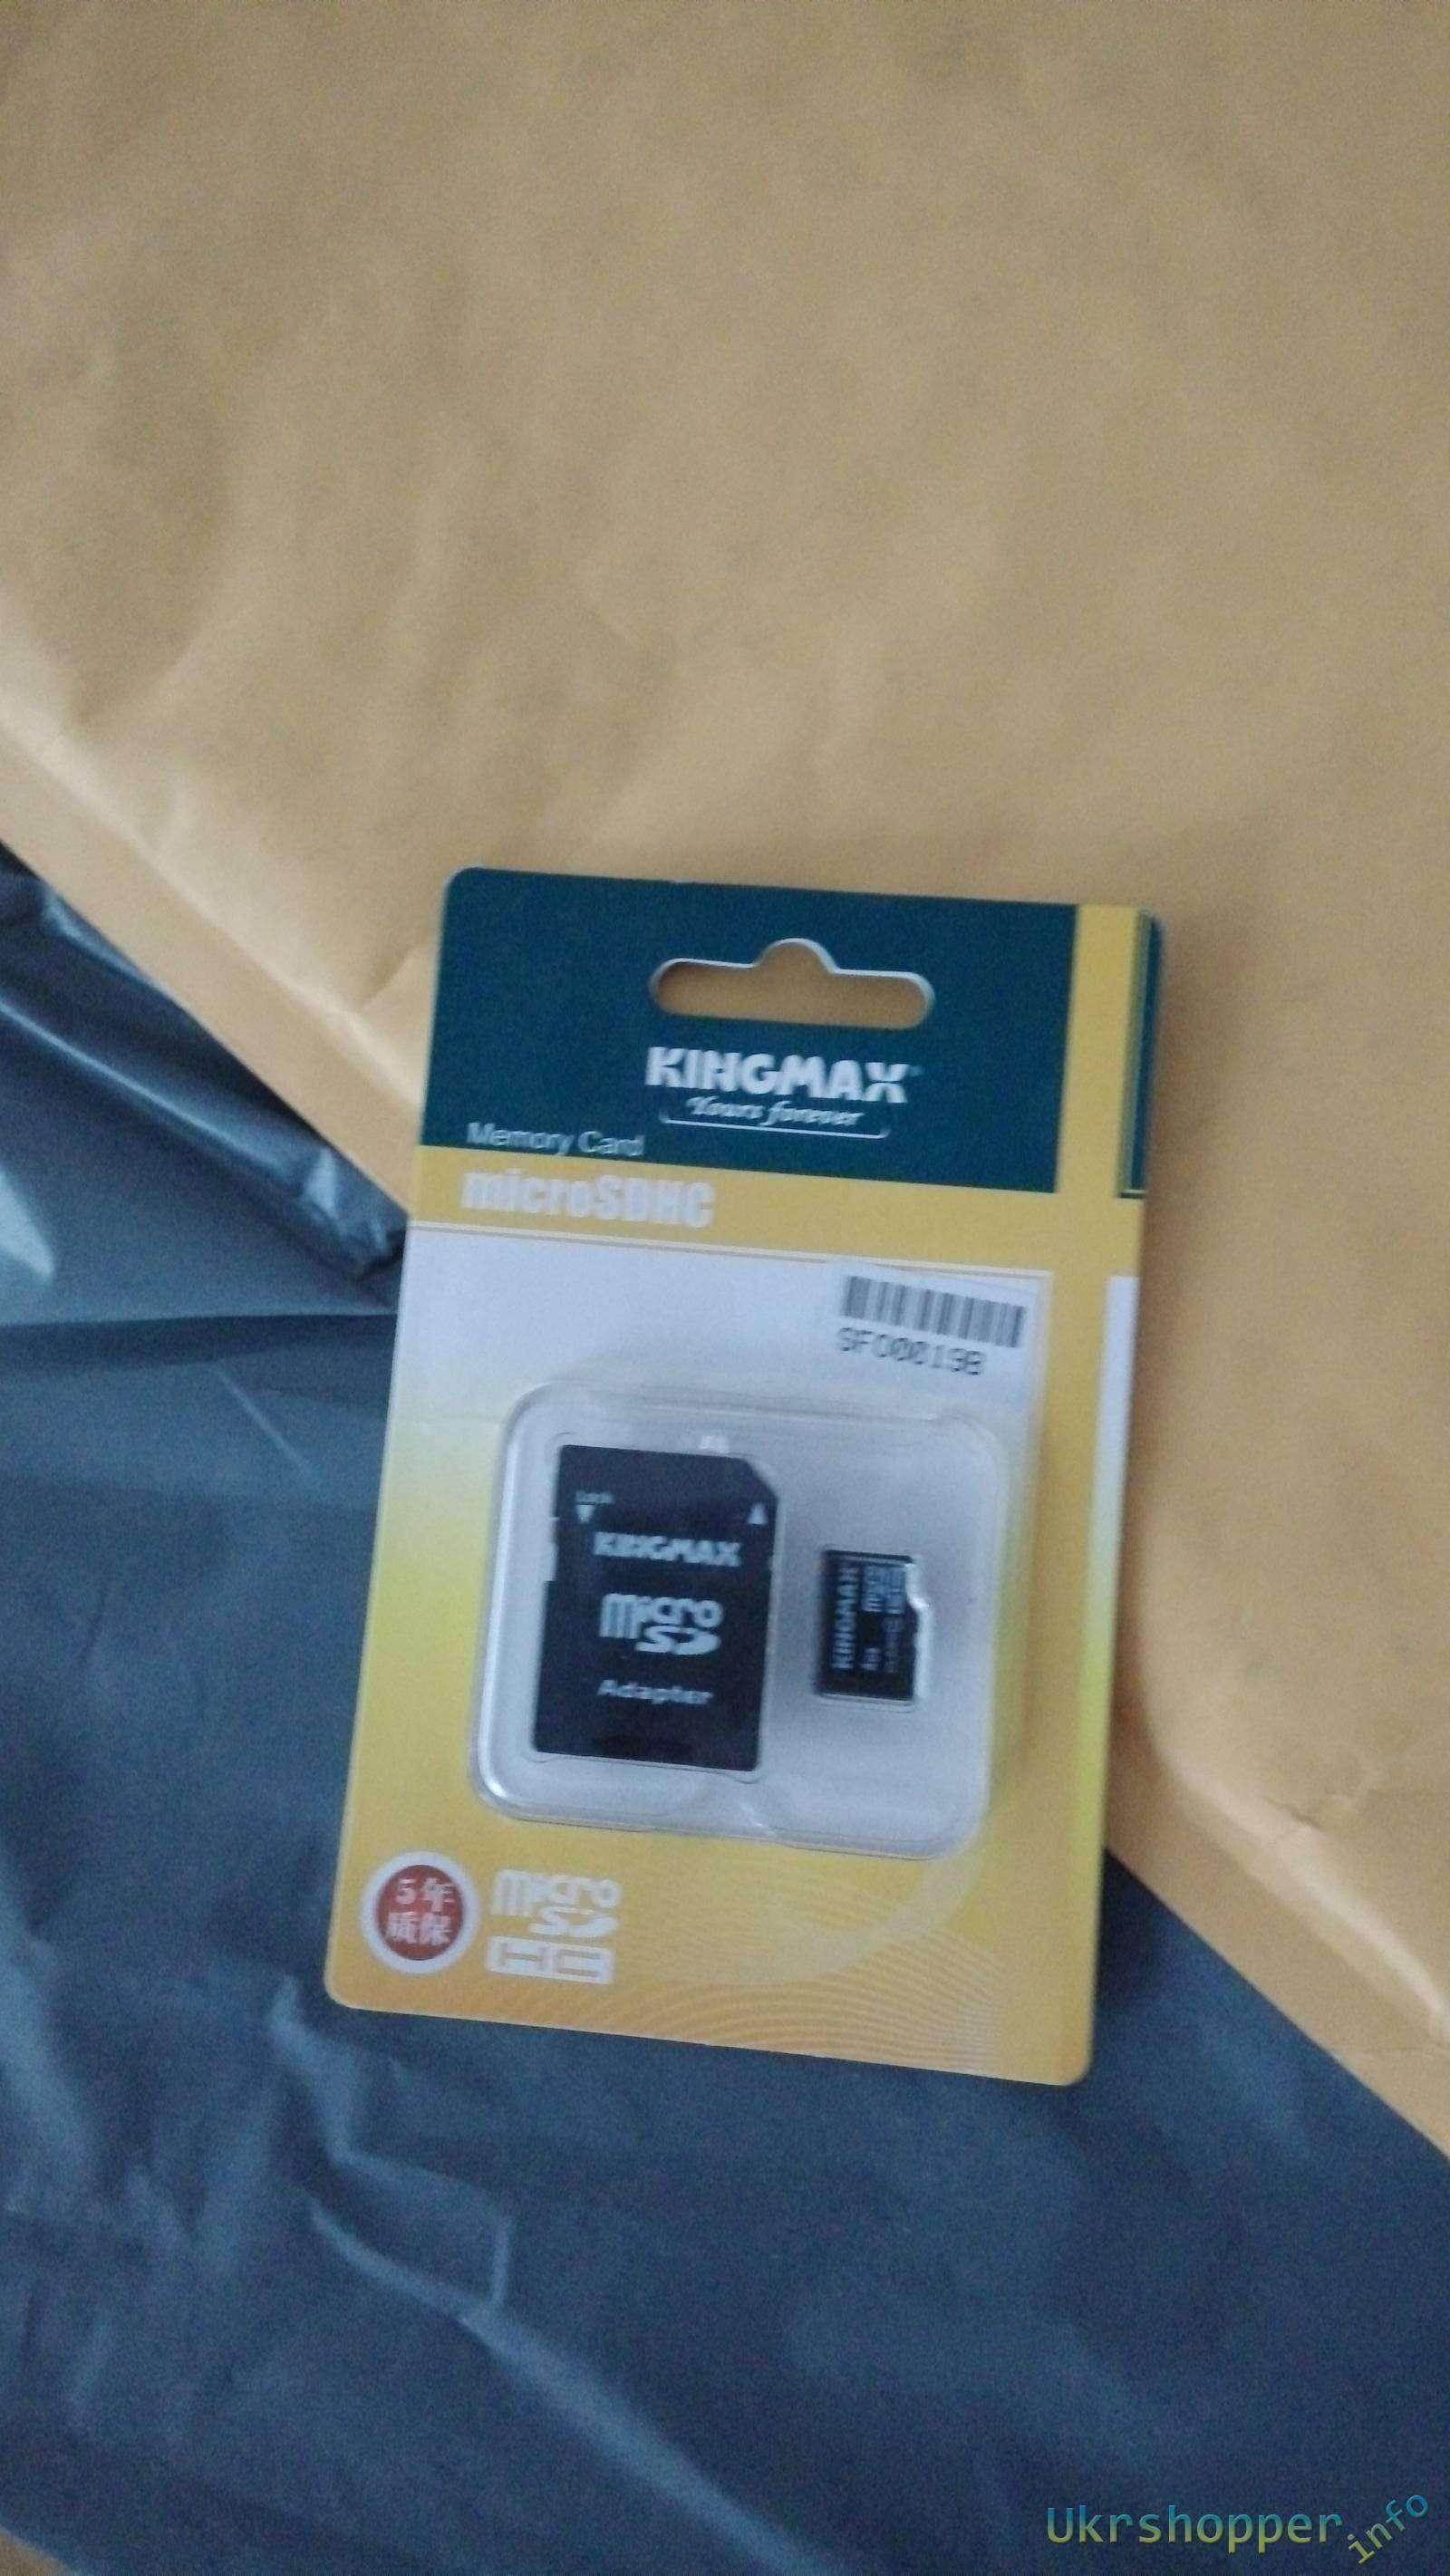 Aliexpress: Карта памяти Kingmax MicroSD / SDHC 4GB Memory Card with MicroSD